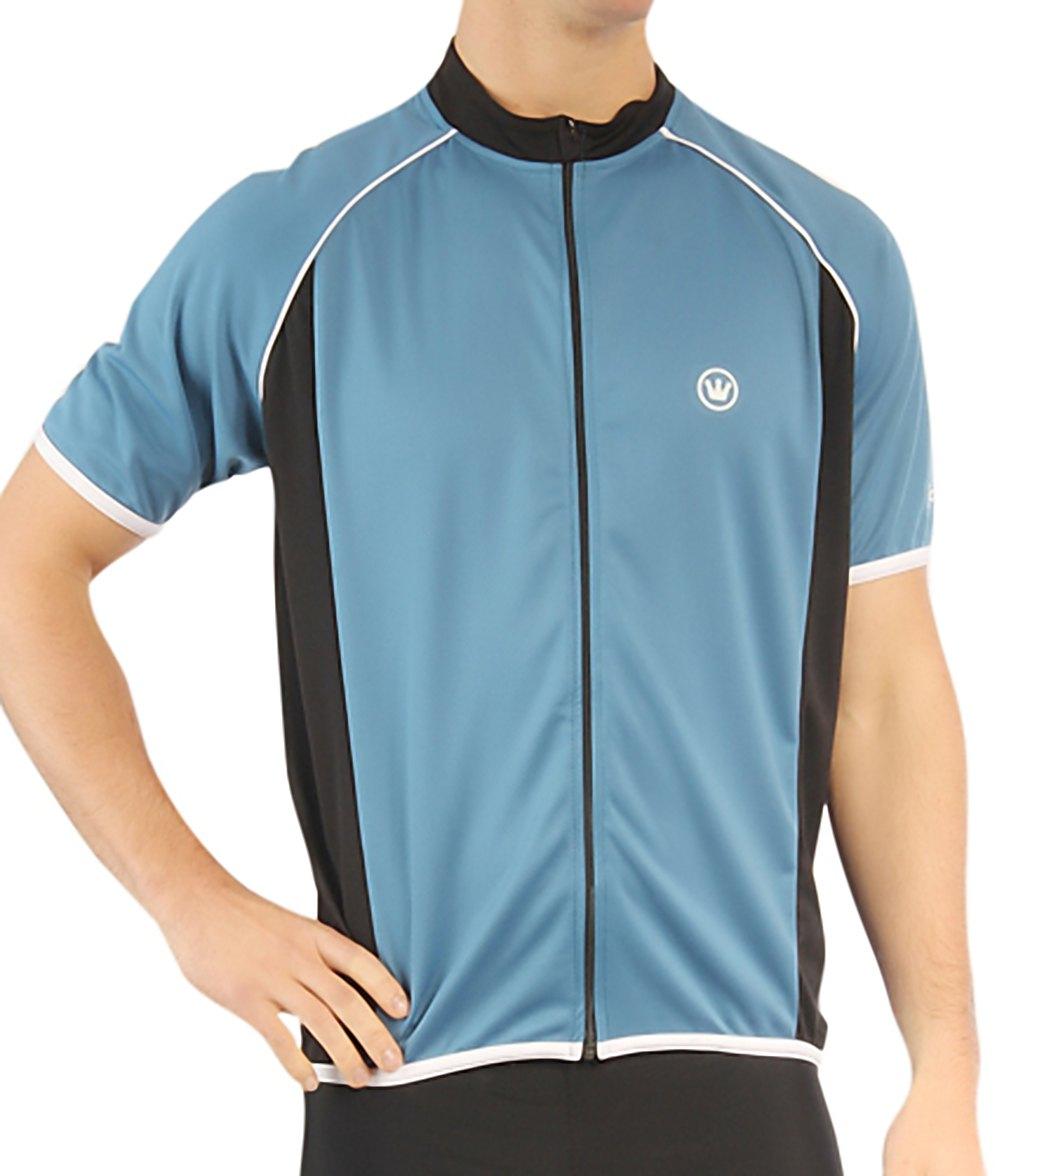 Canari Men s Endurance Cycling Jersey at SwimOutlet.com 3c7366519